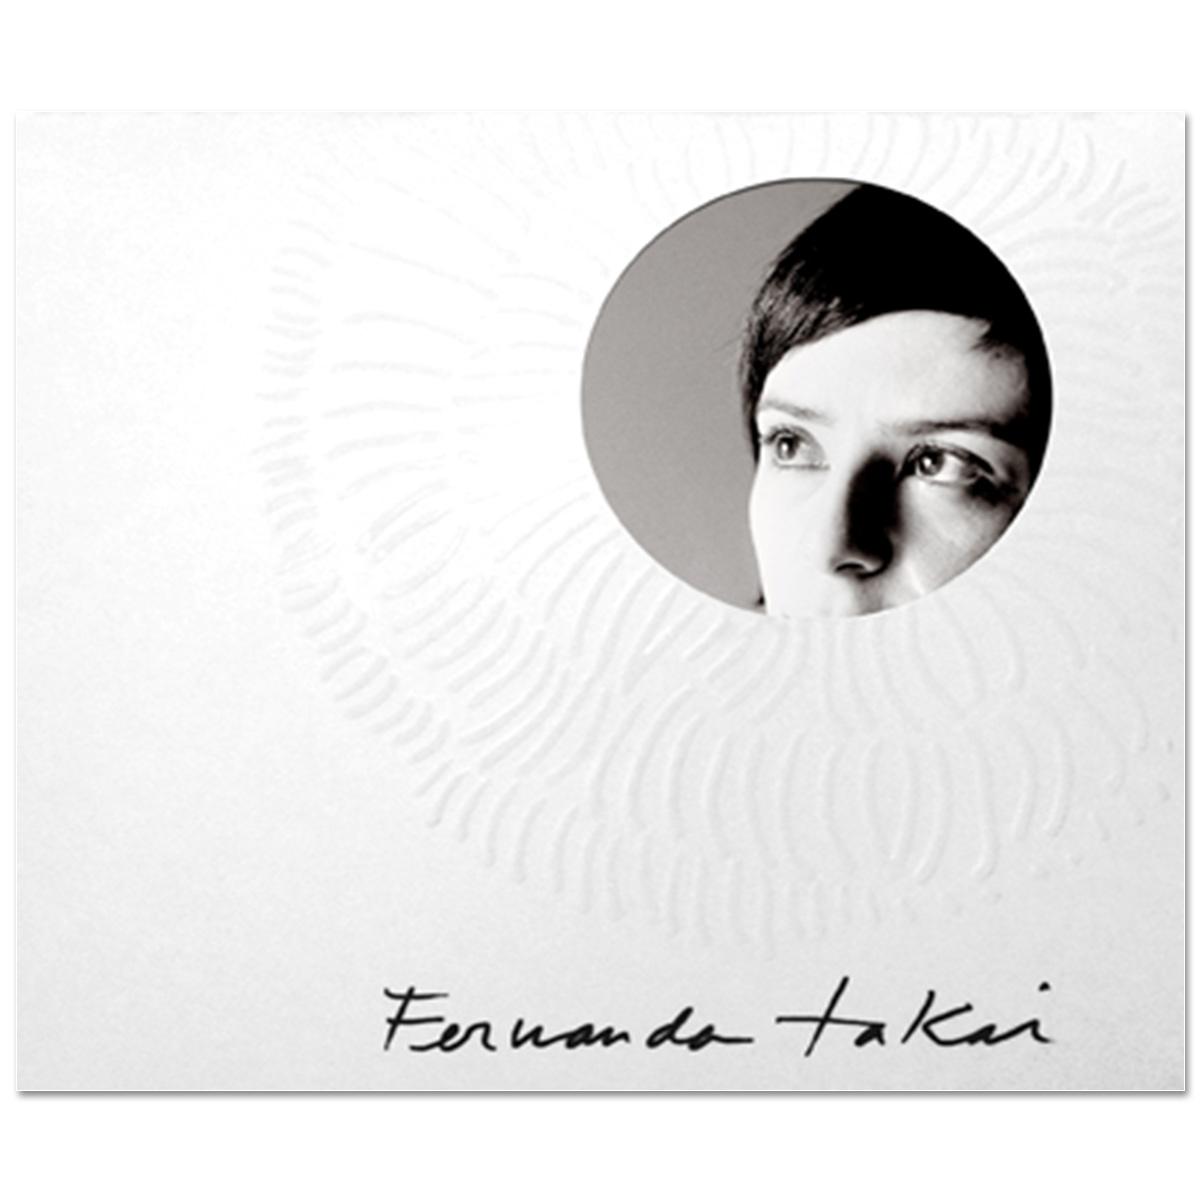 Fernanda Takai - LP Onde Brilhem Os Olhos Seus